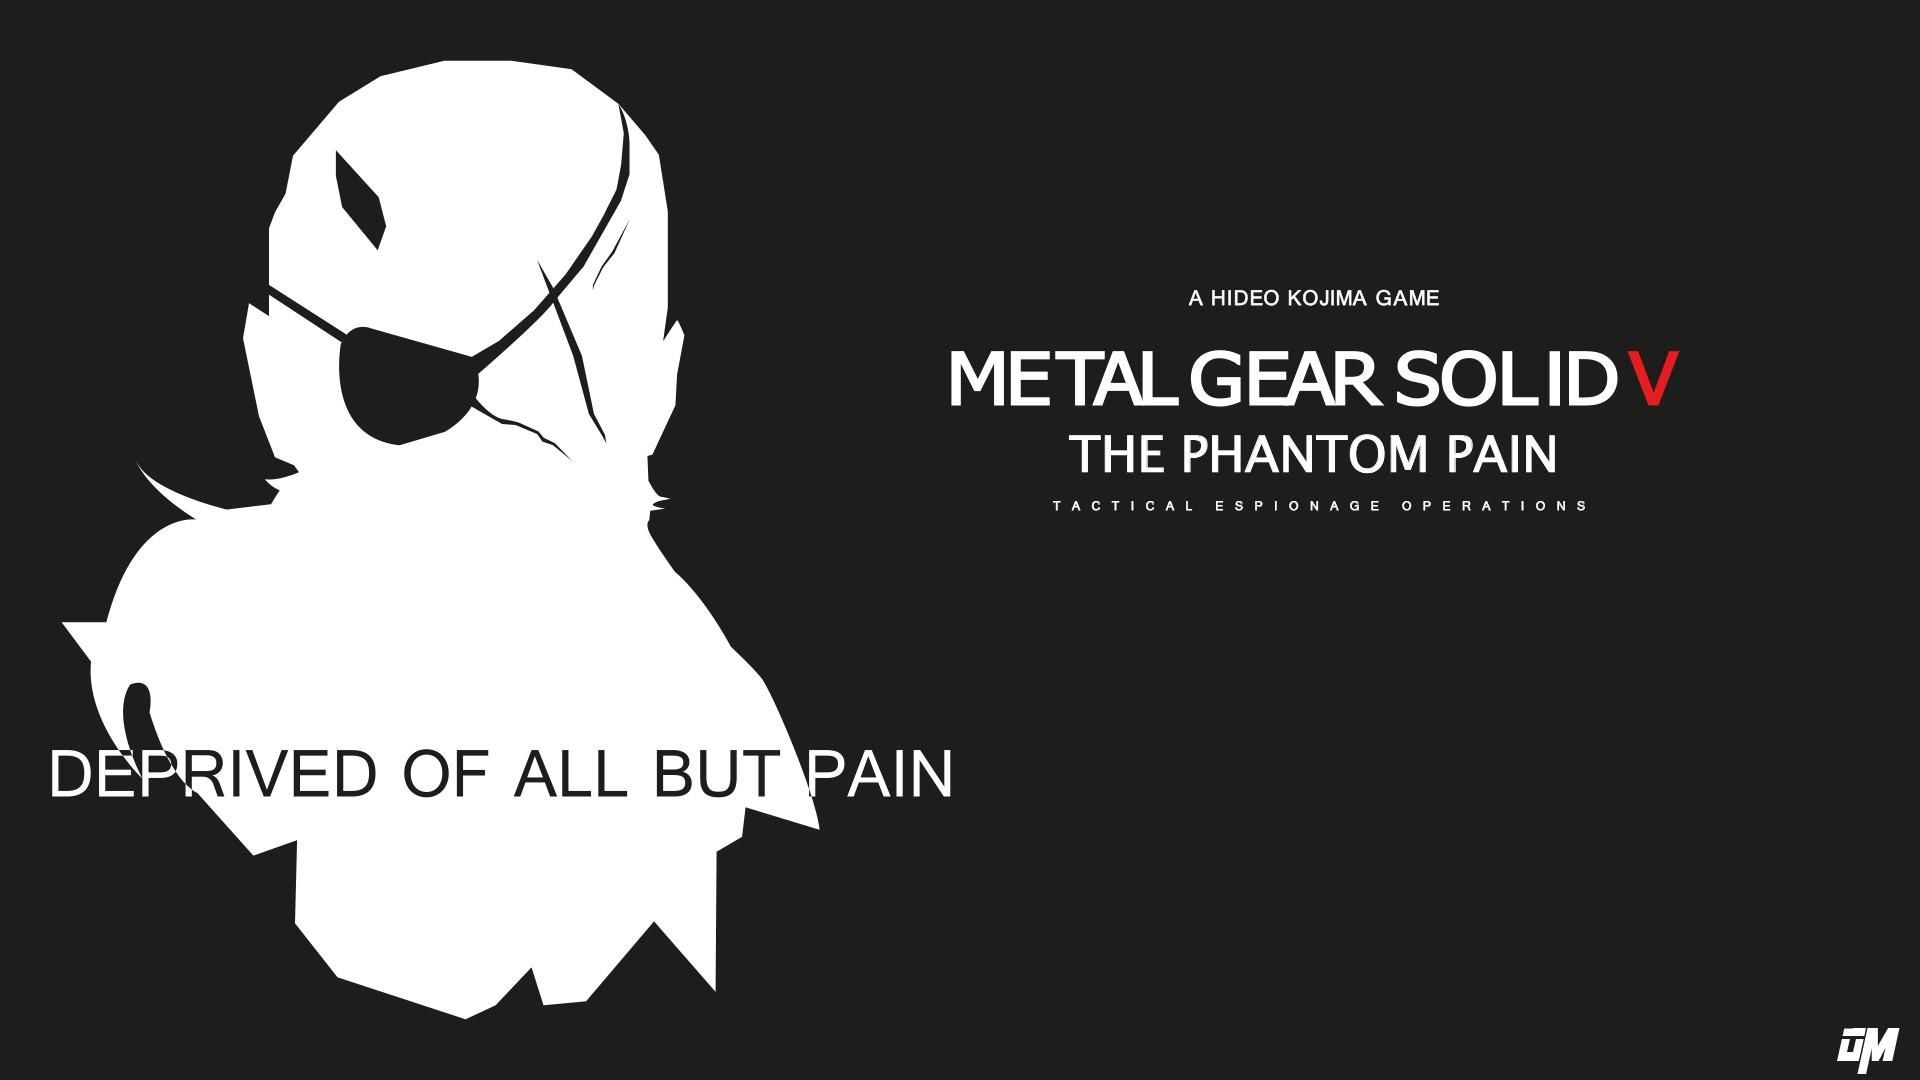 … Metal Gear Solid V The Phantom Pain BLACK VERSION by OscarManzi